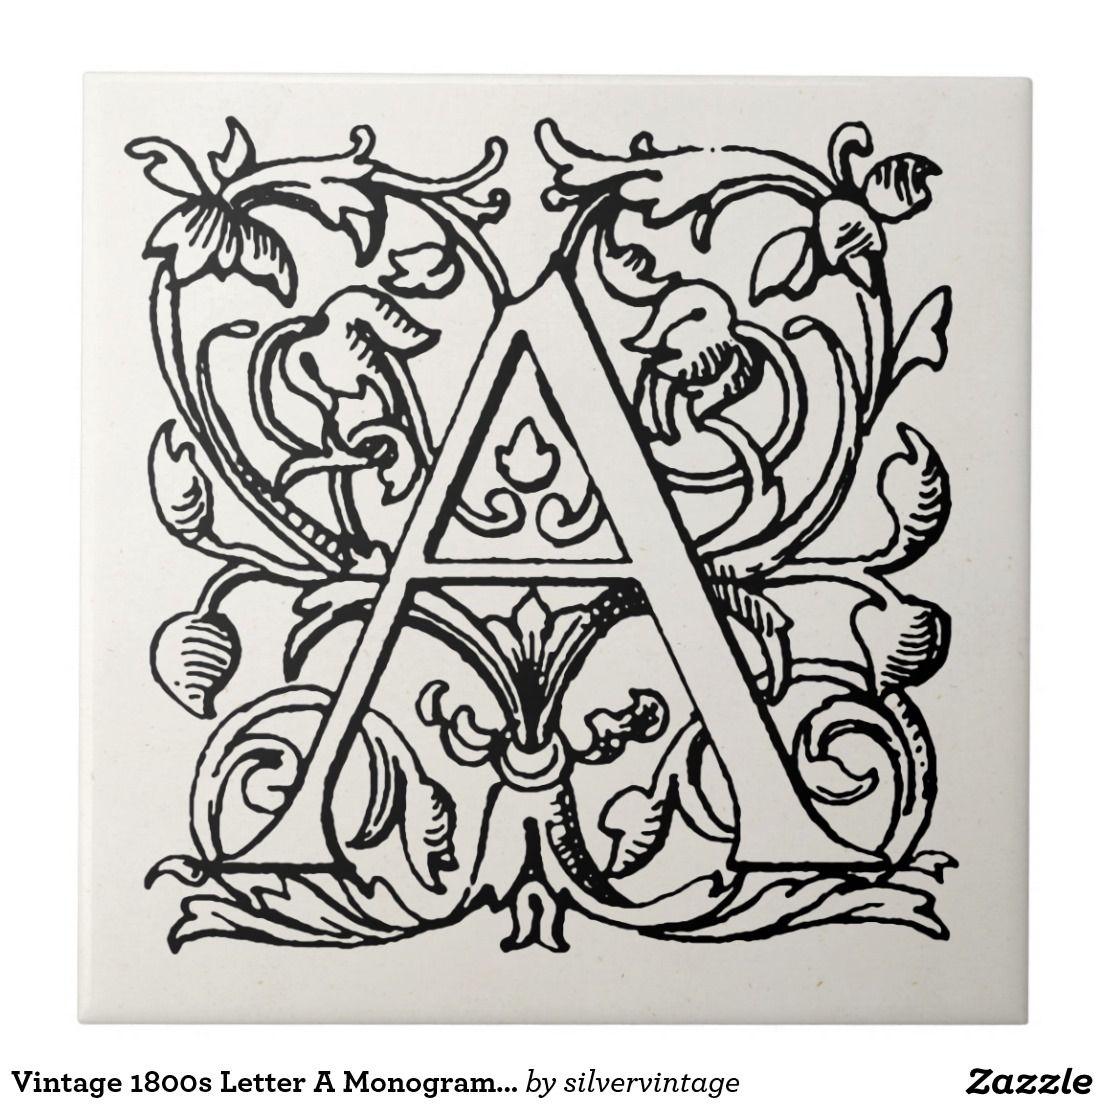 Vintage 1800s letter a monogram monogrammed a ceramic tile vintage 1800s letter a monogram monogrammed a ceramic tile doublecrazyfo Image collections